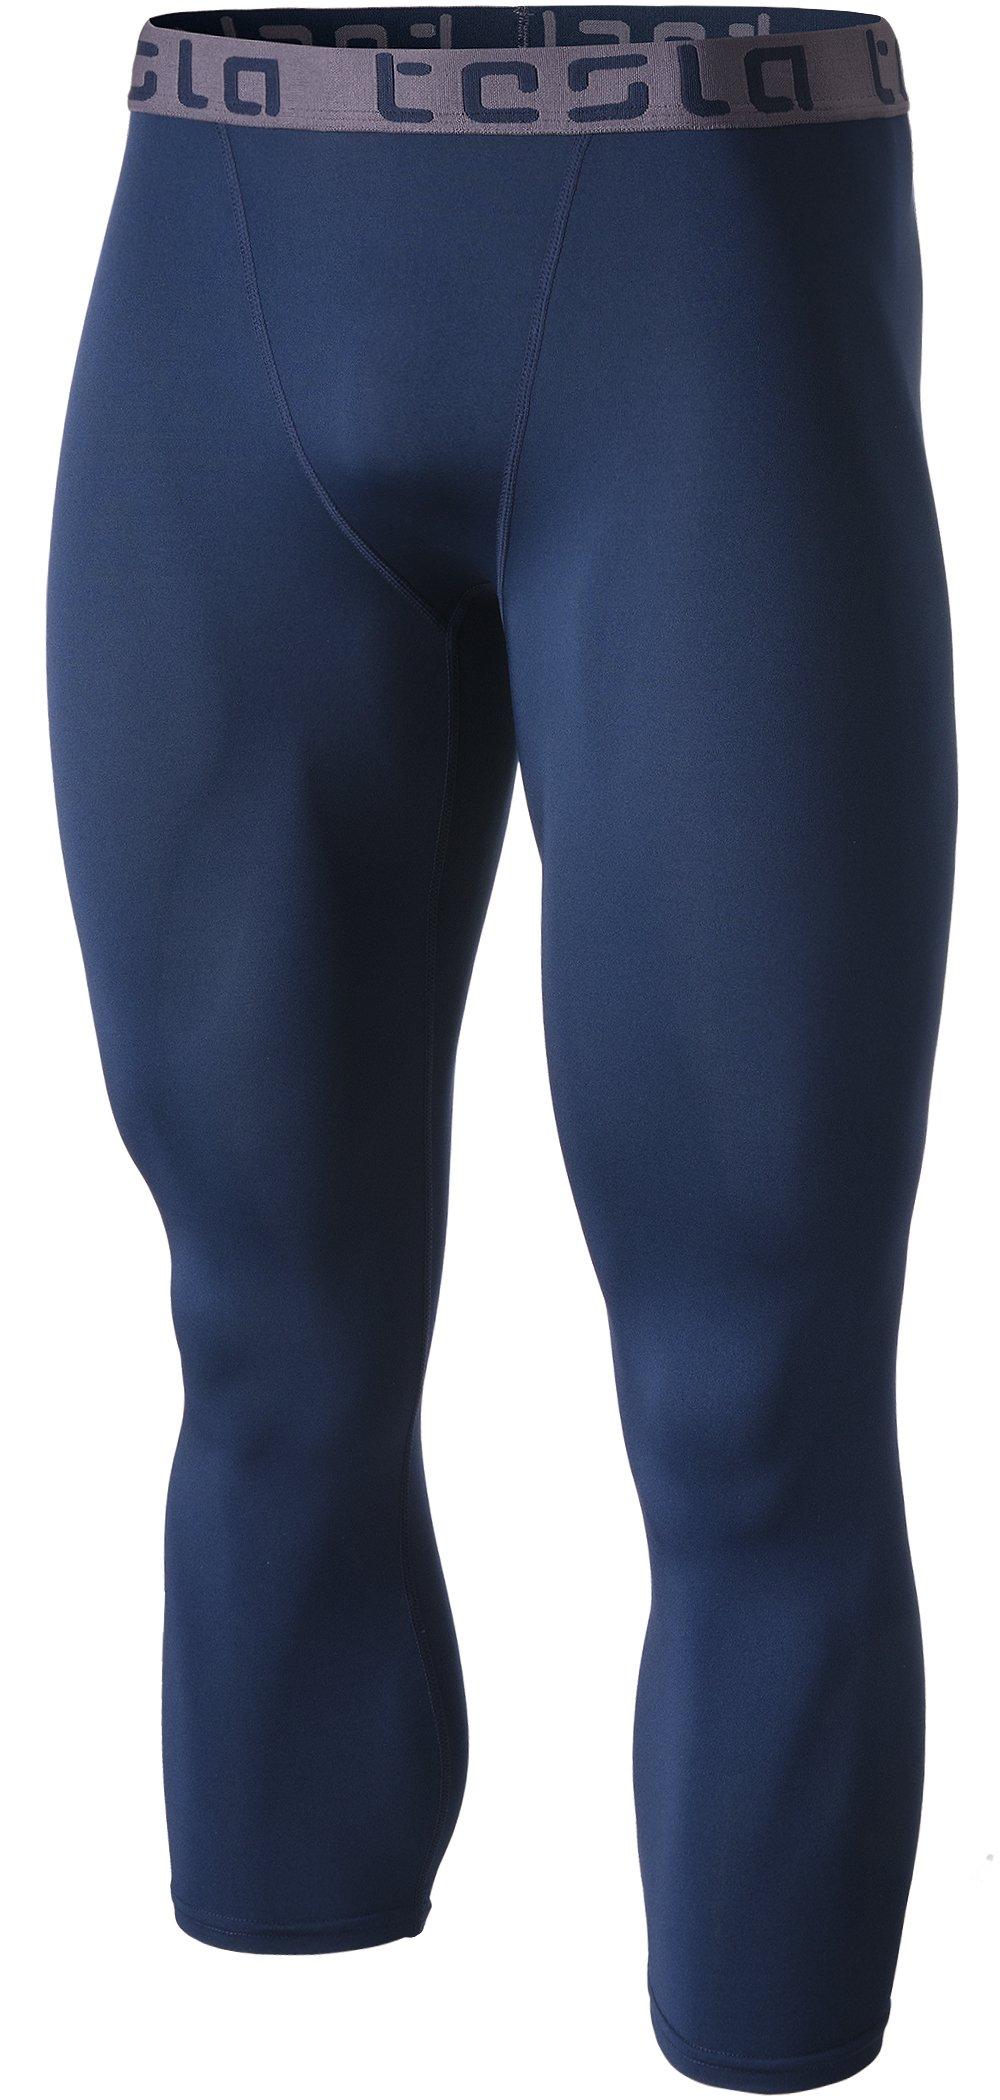 Tesla TM-MUC08-NVY_X-Large Men's Compression Capri Shorts Baselayer Cool Dry Sports Tights MUC08